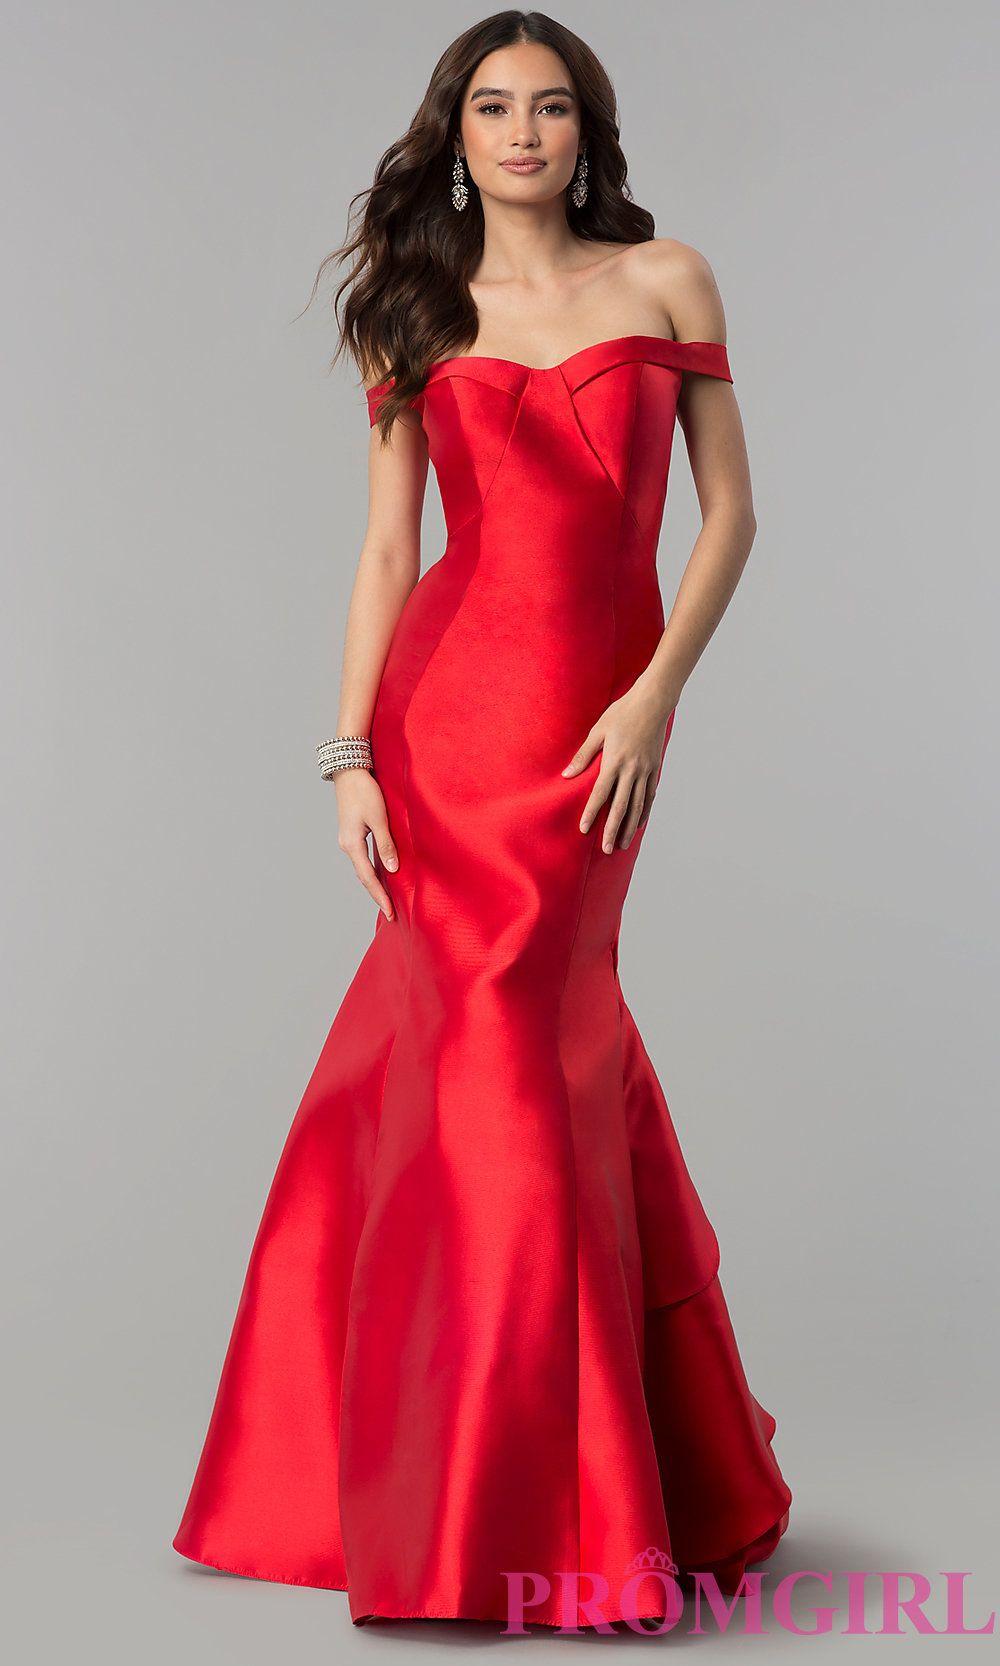 Off The Shoulder Long Prom Dress Dresses Prom Dresses Satin Prom Dress [ 1666 x 1000 Pixel ]